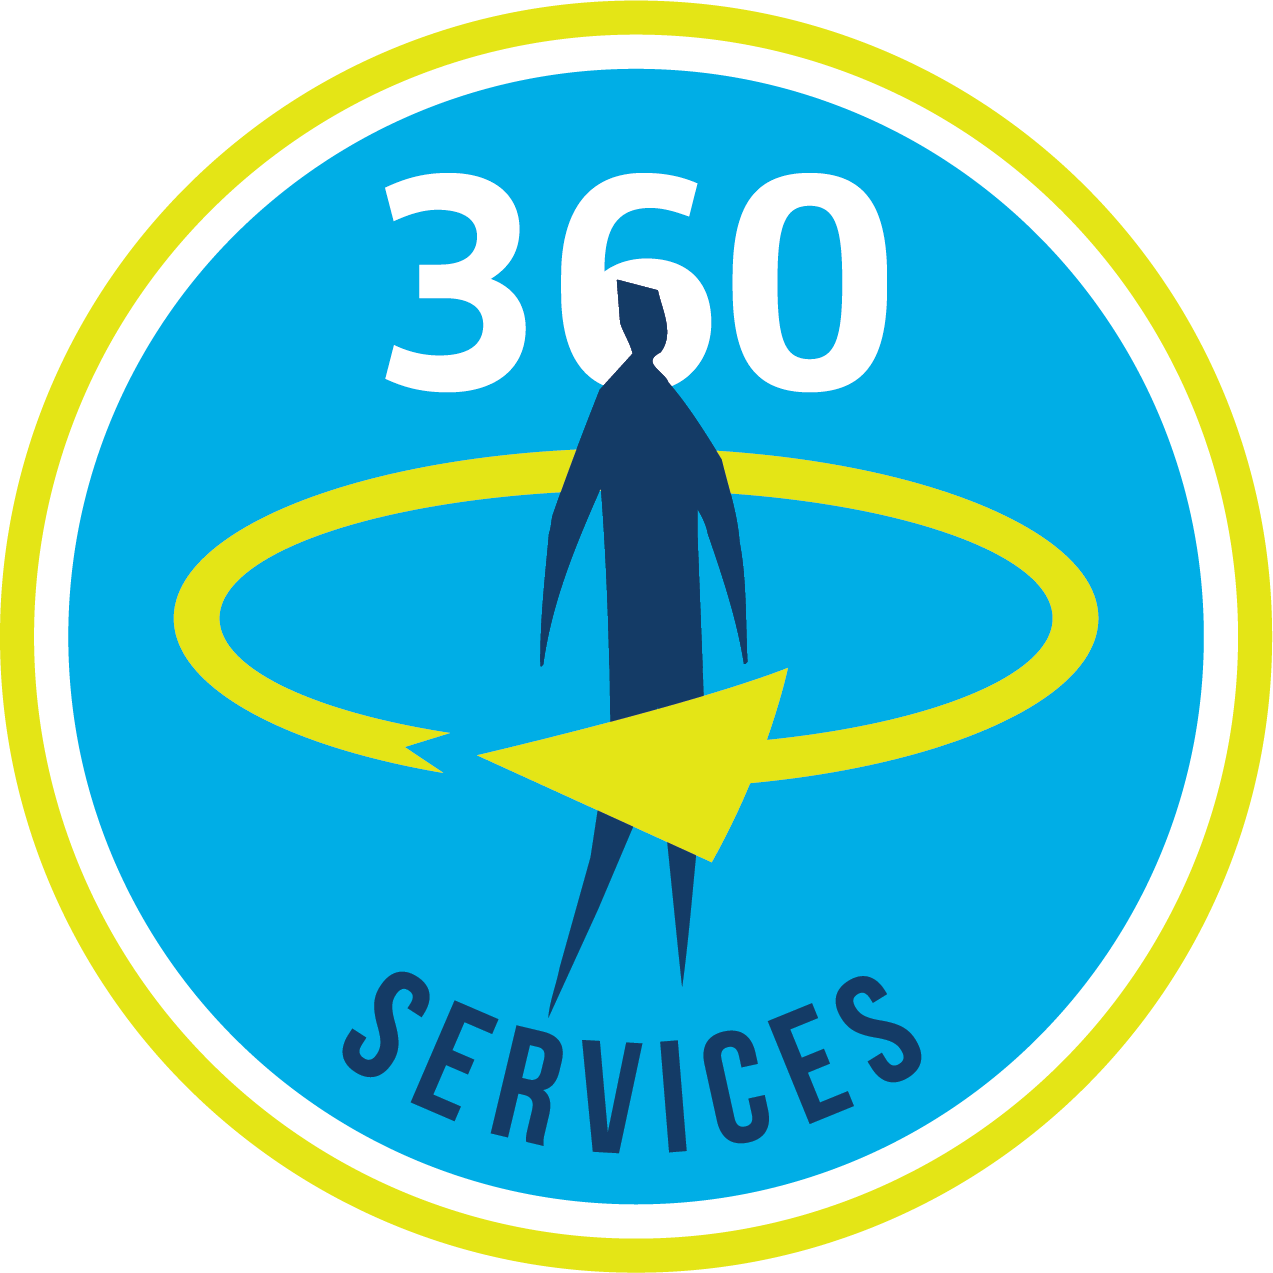 aclvb-universele_diensten-logo-cmyk_ok_fr_2.png